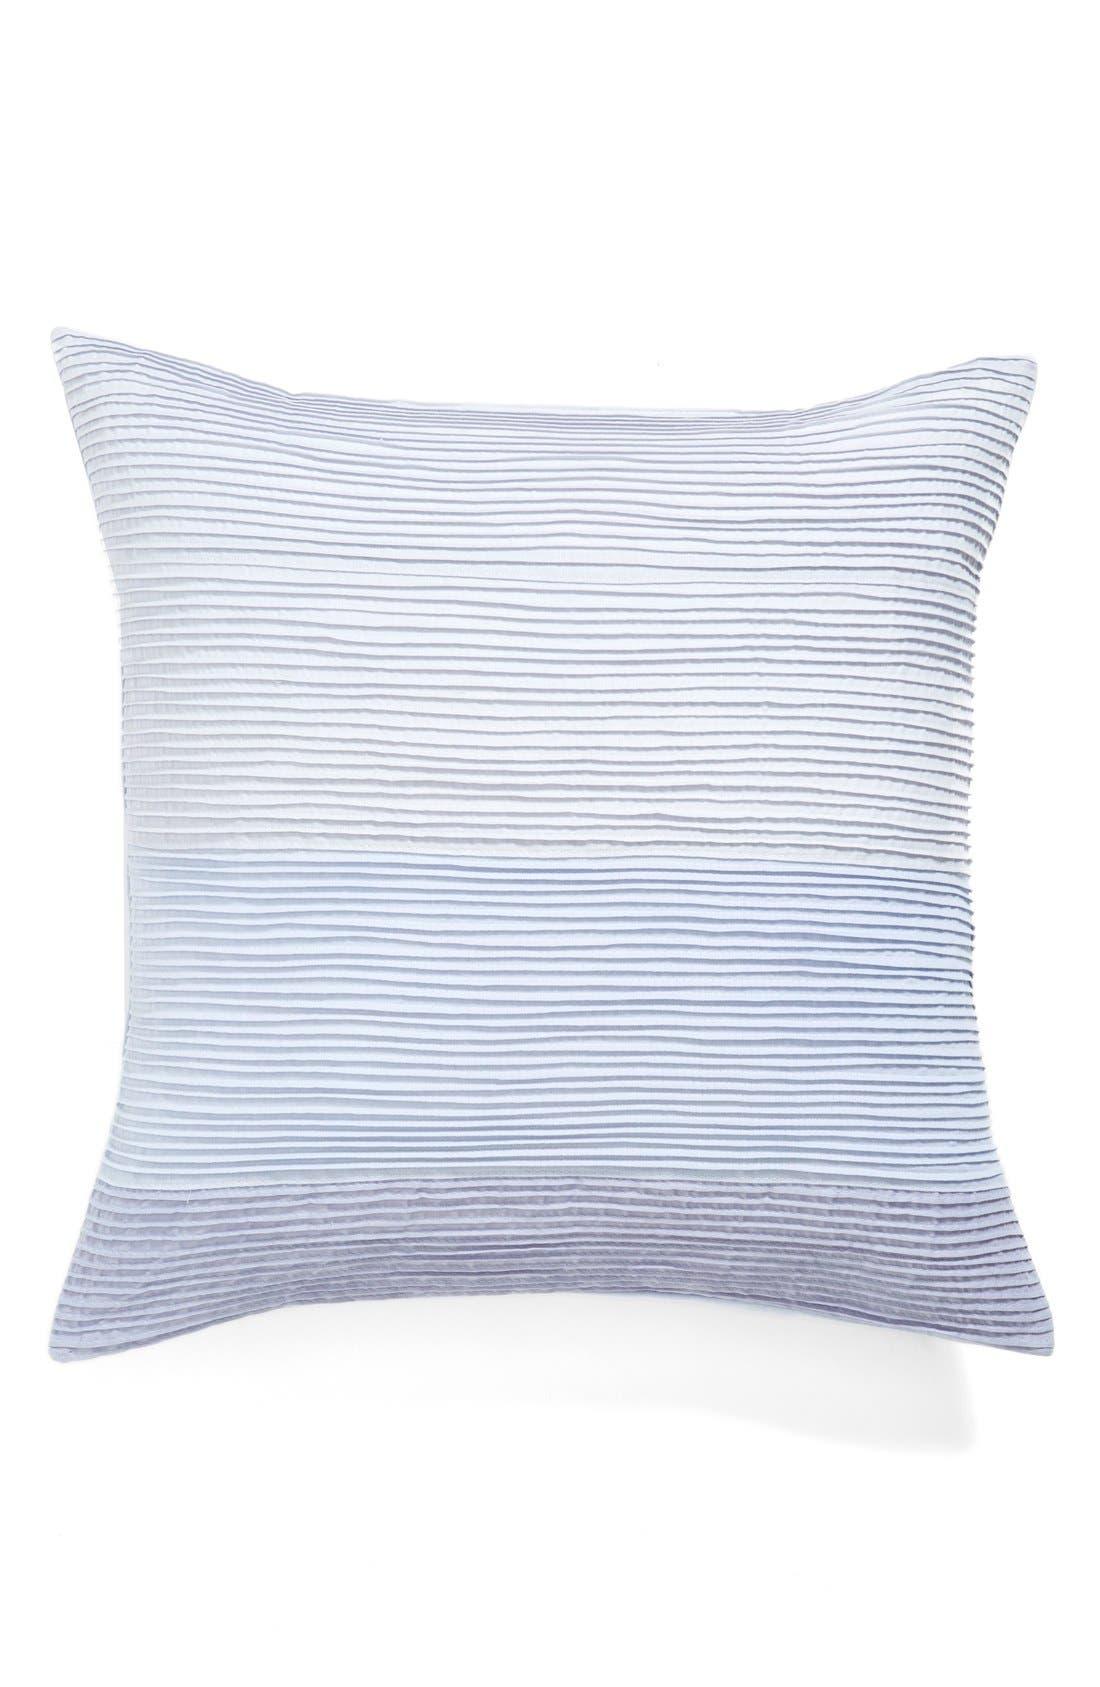 Main Image - Vera Wang 'Scrolls' Tucked Pillow